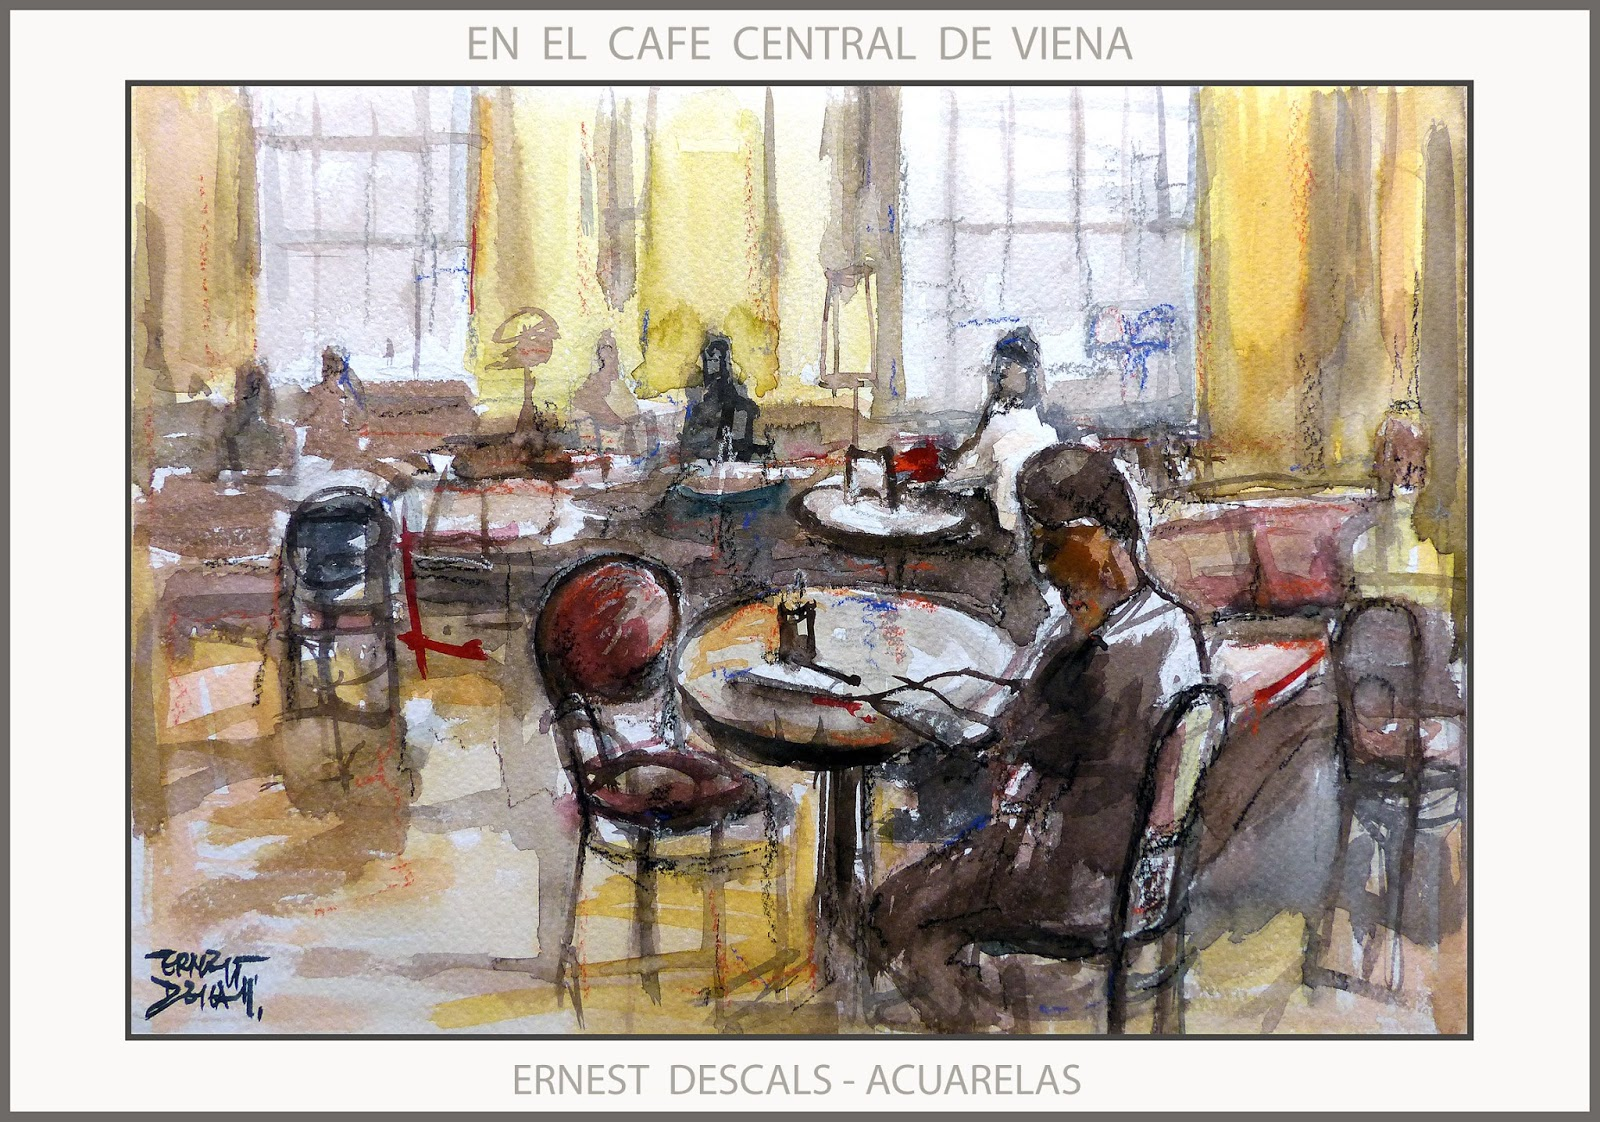 Ernest Descals Artista Pintor Viena Pinturas Austria